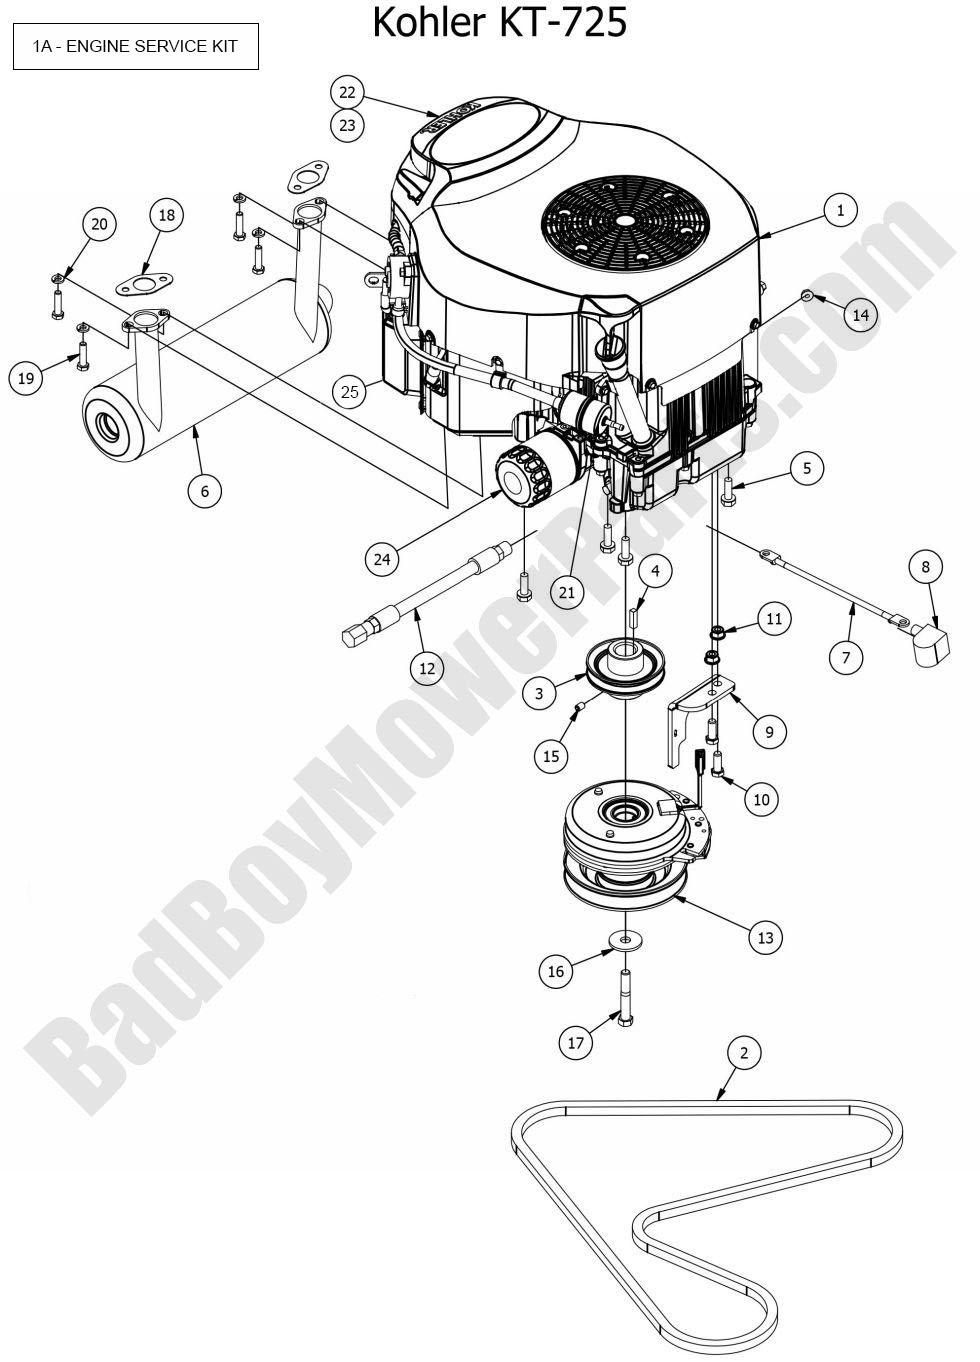 2504m commando wiring diagram kohler